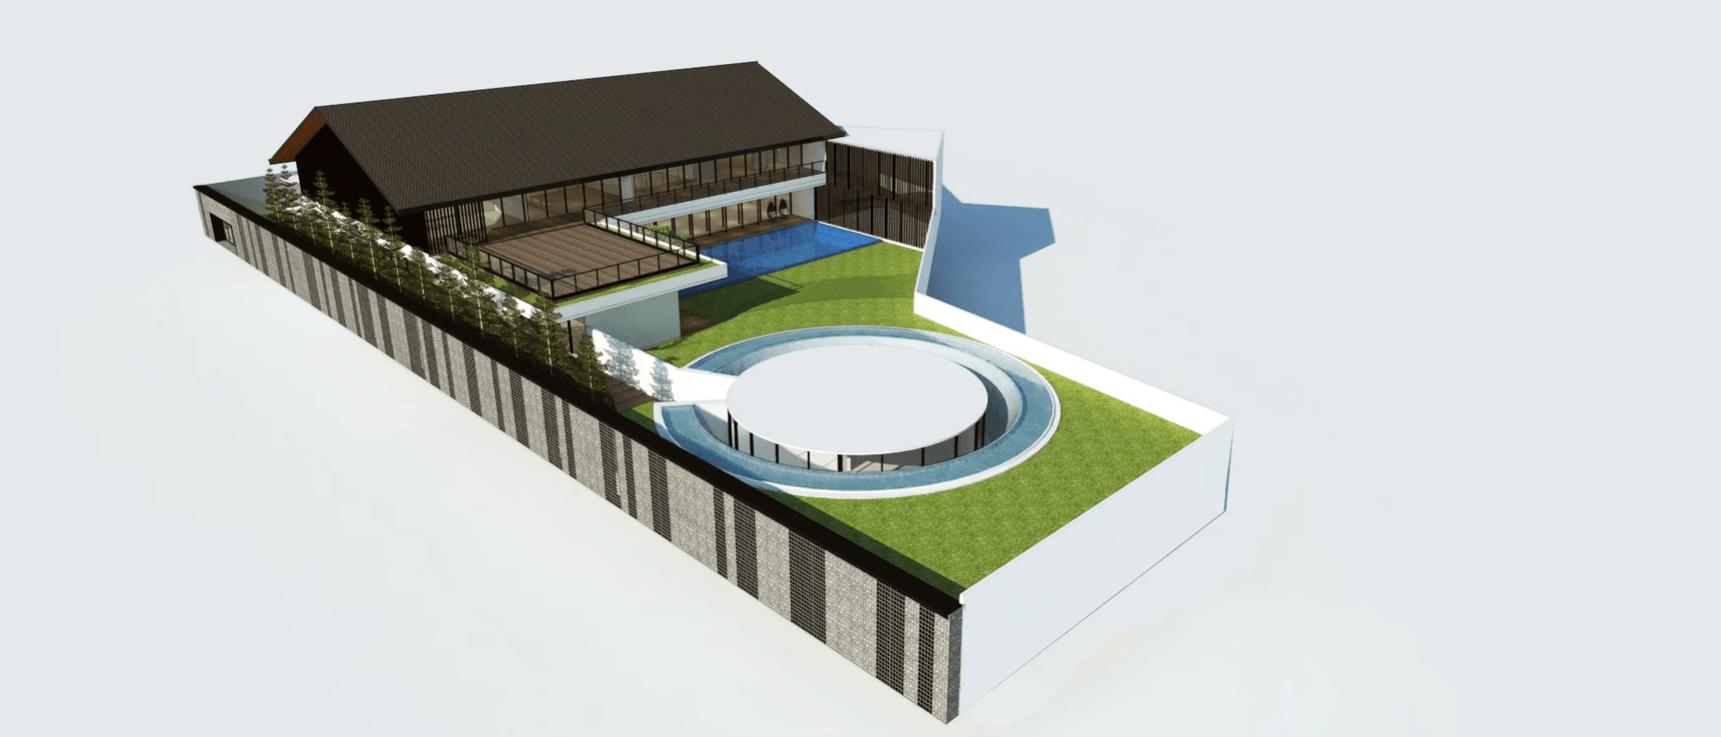 Ari Wibowo Design (Aw.d) Sw House Kec. Sawangan, Kota Depok, Jawa Barat, Indonesia Kec. Sawangan, Kota Depok, Jawa Barat, Indonesia Ari-Wibowo-Design-Awd-Sw-House   96816